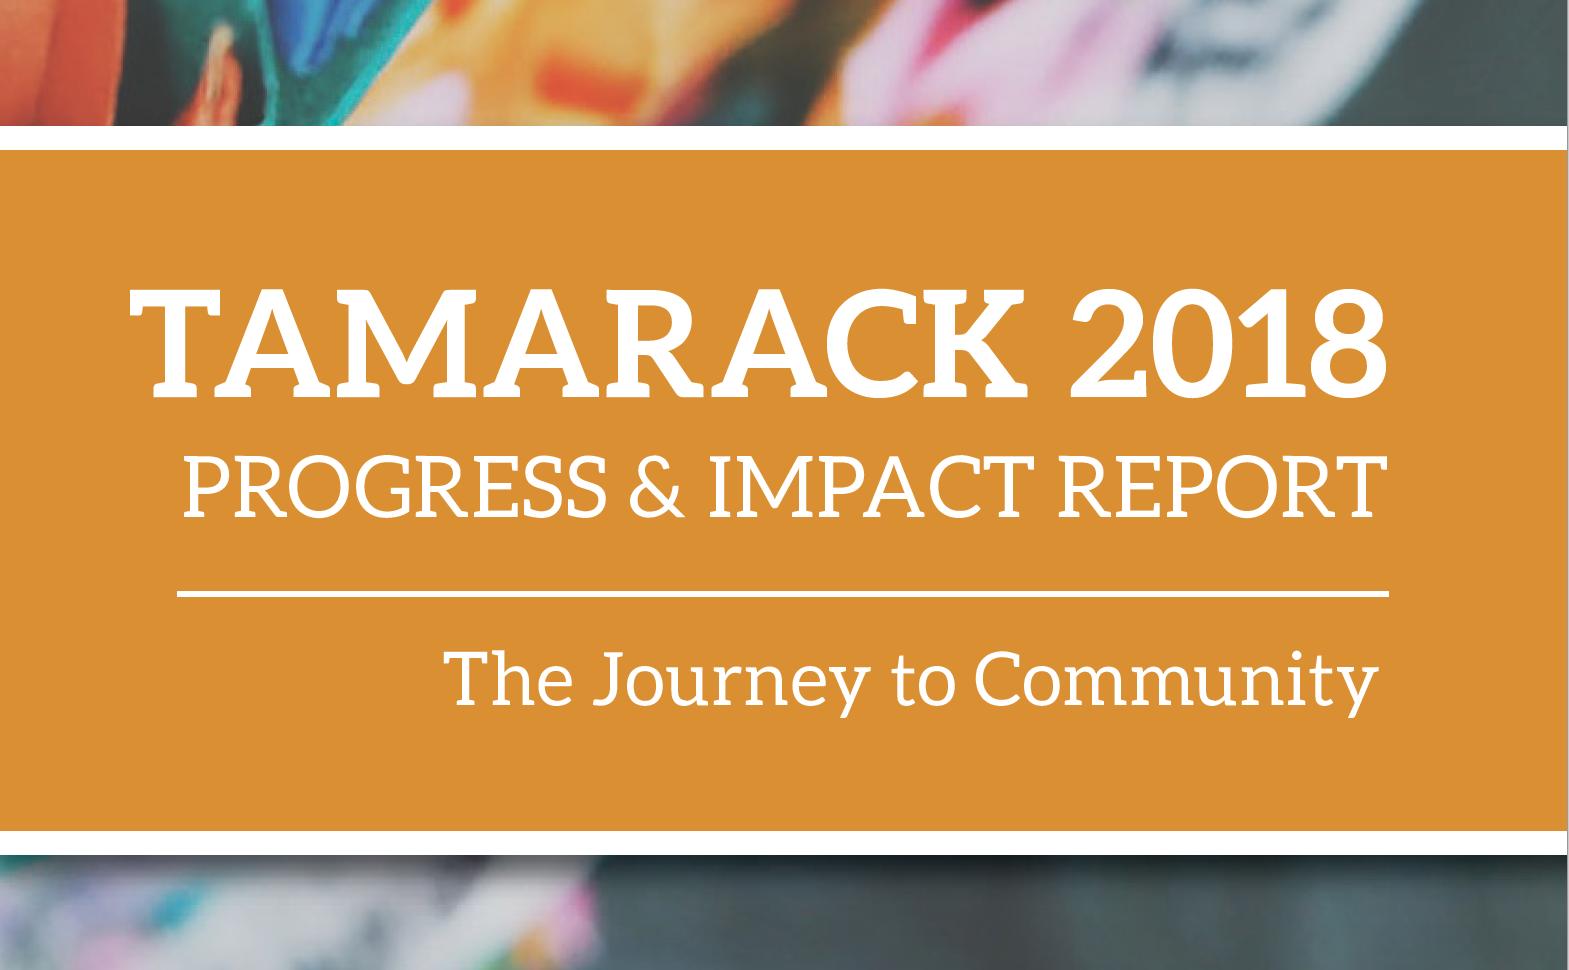 2018 Annual Report Thumbnail